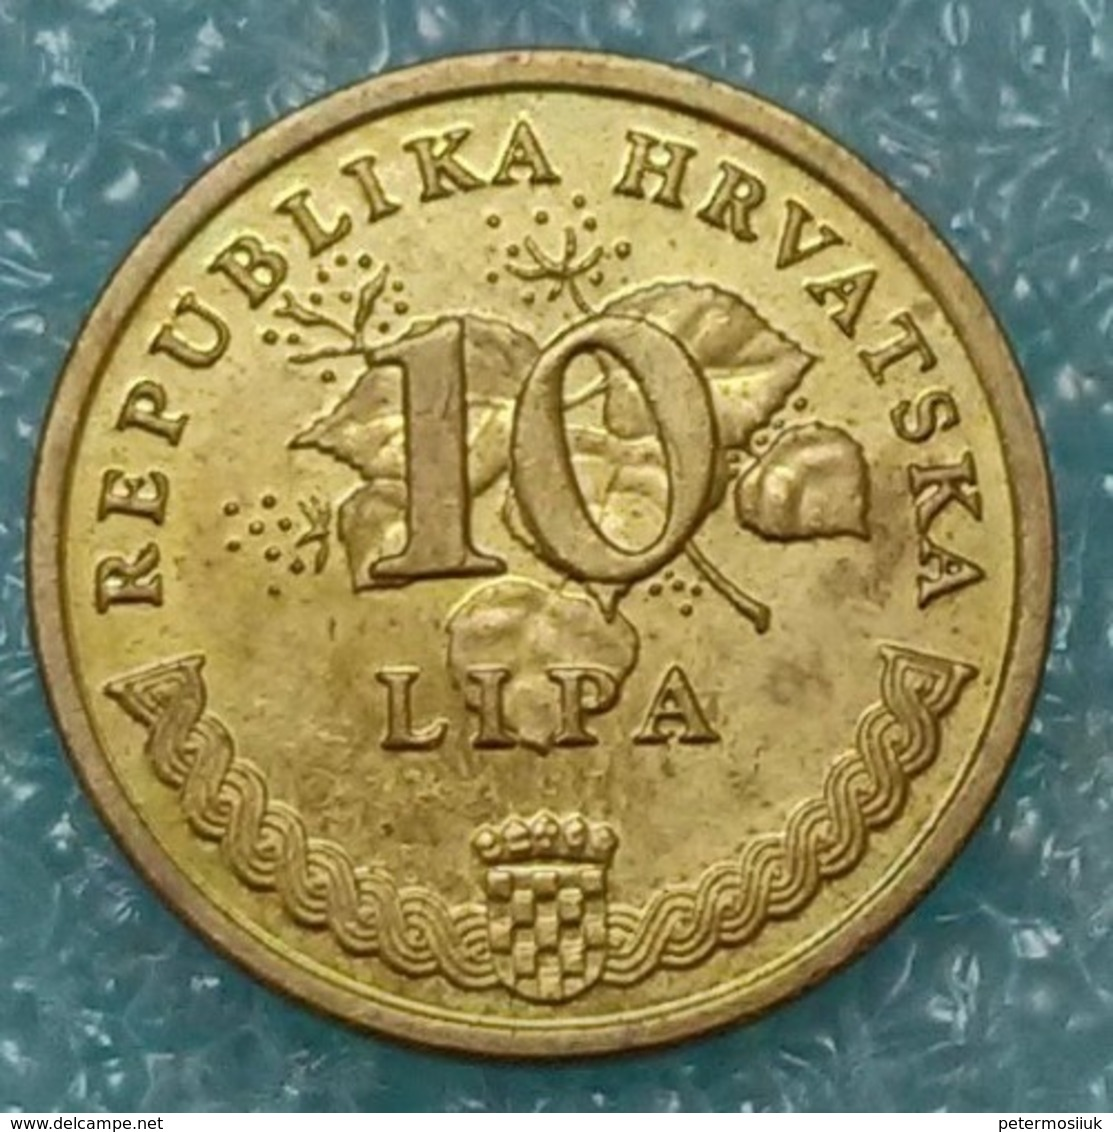 Croatia 10 Lipa, 2005 ↓price↓ - Croatia